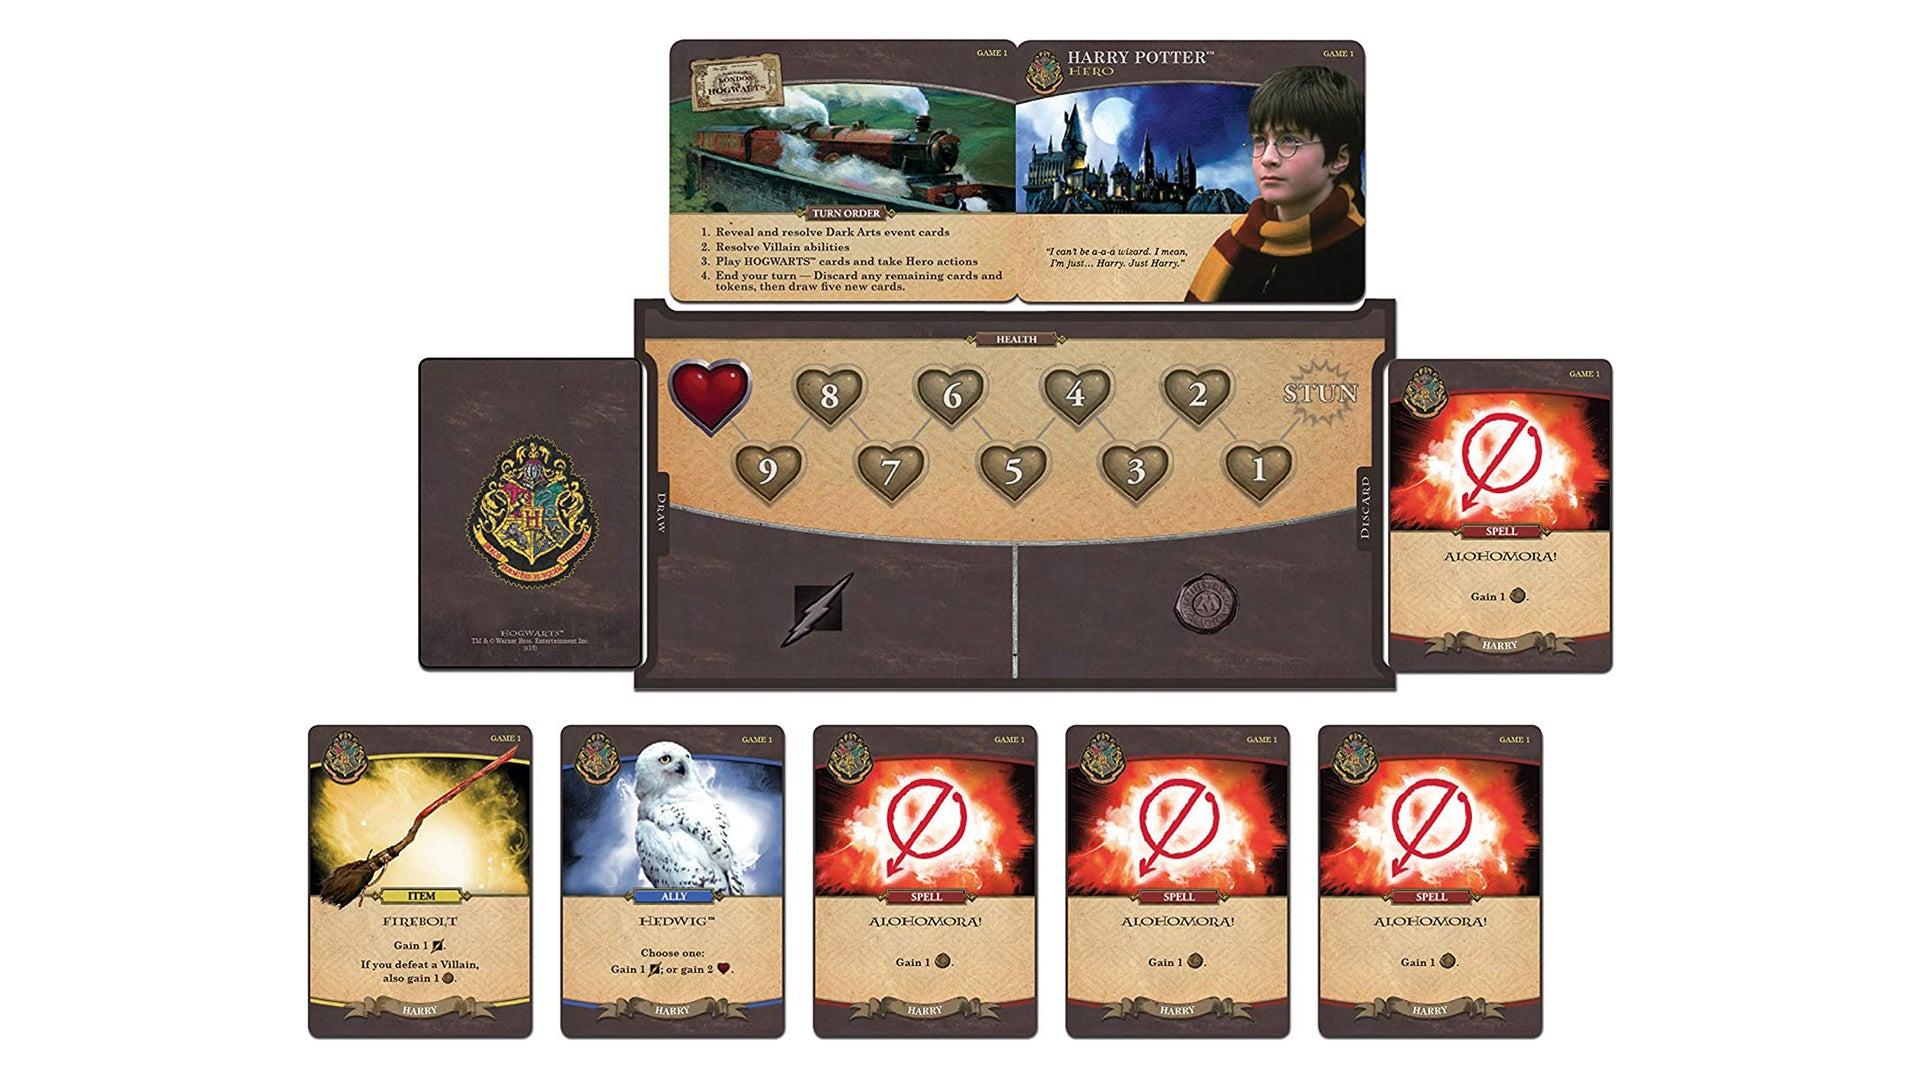 Harry Potter: Hogwarts Battle board gameHarry